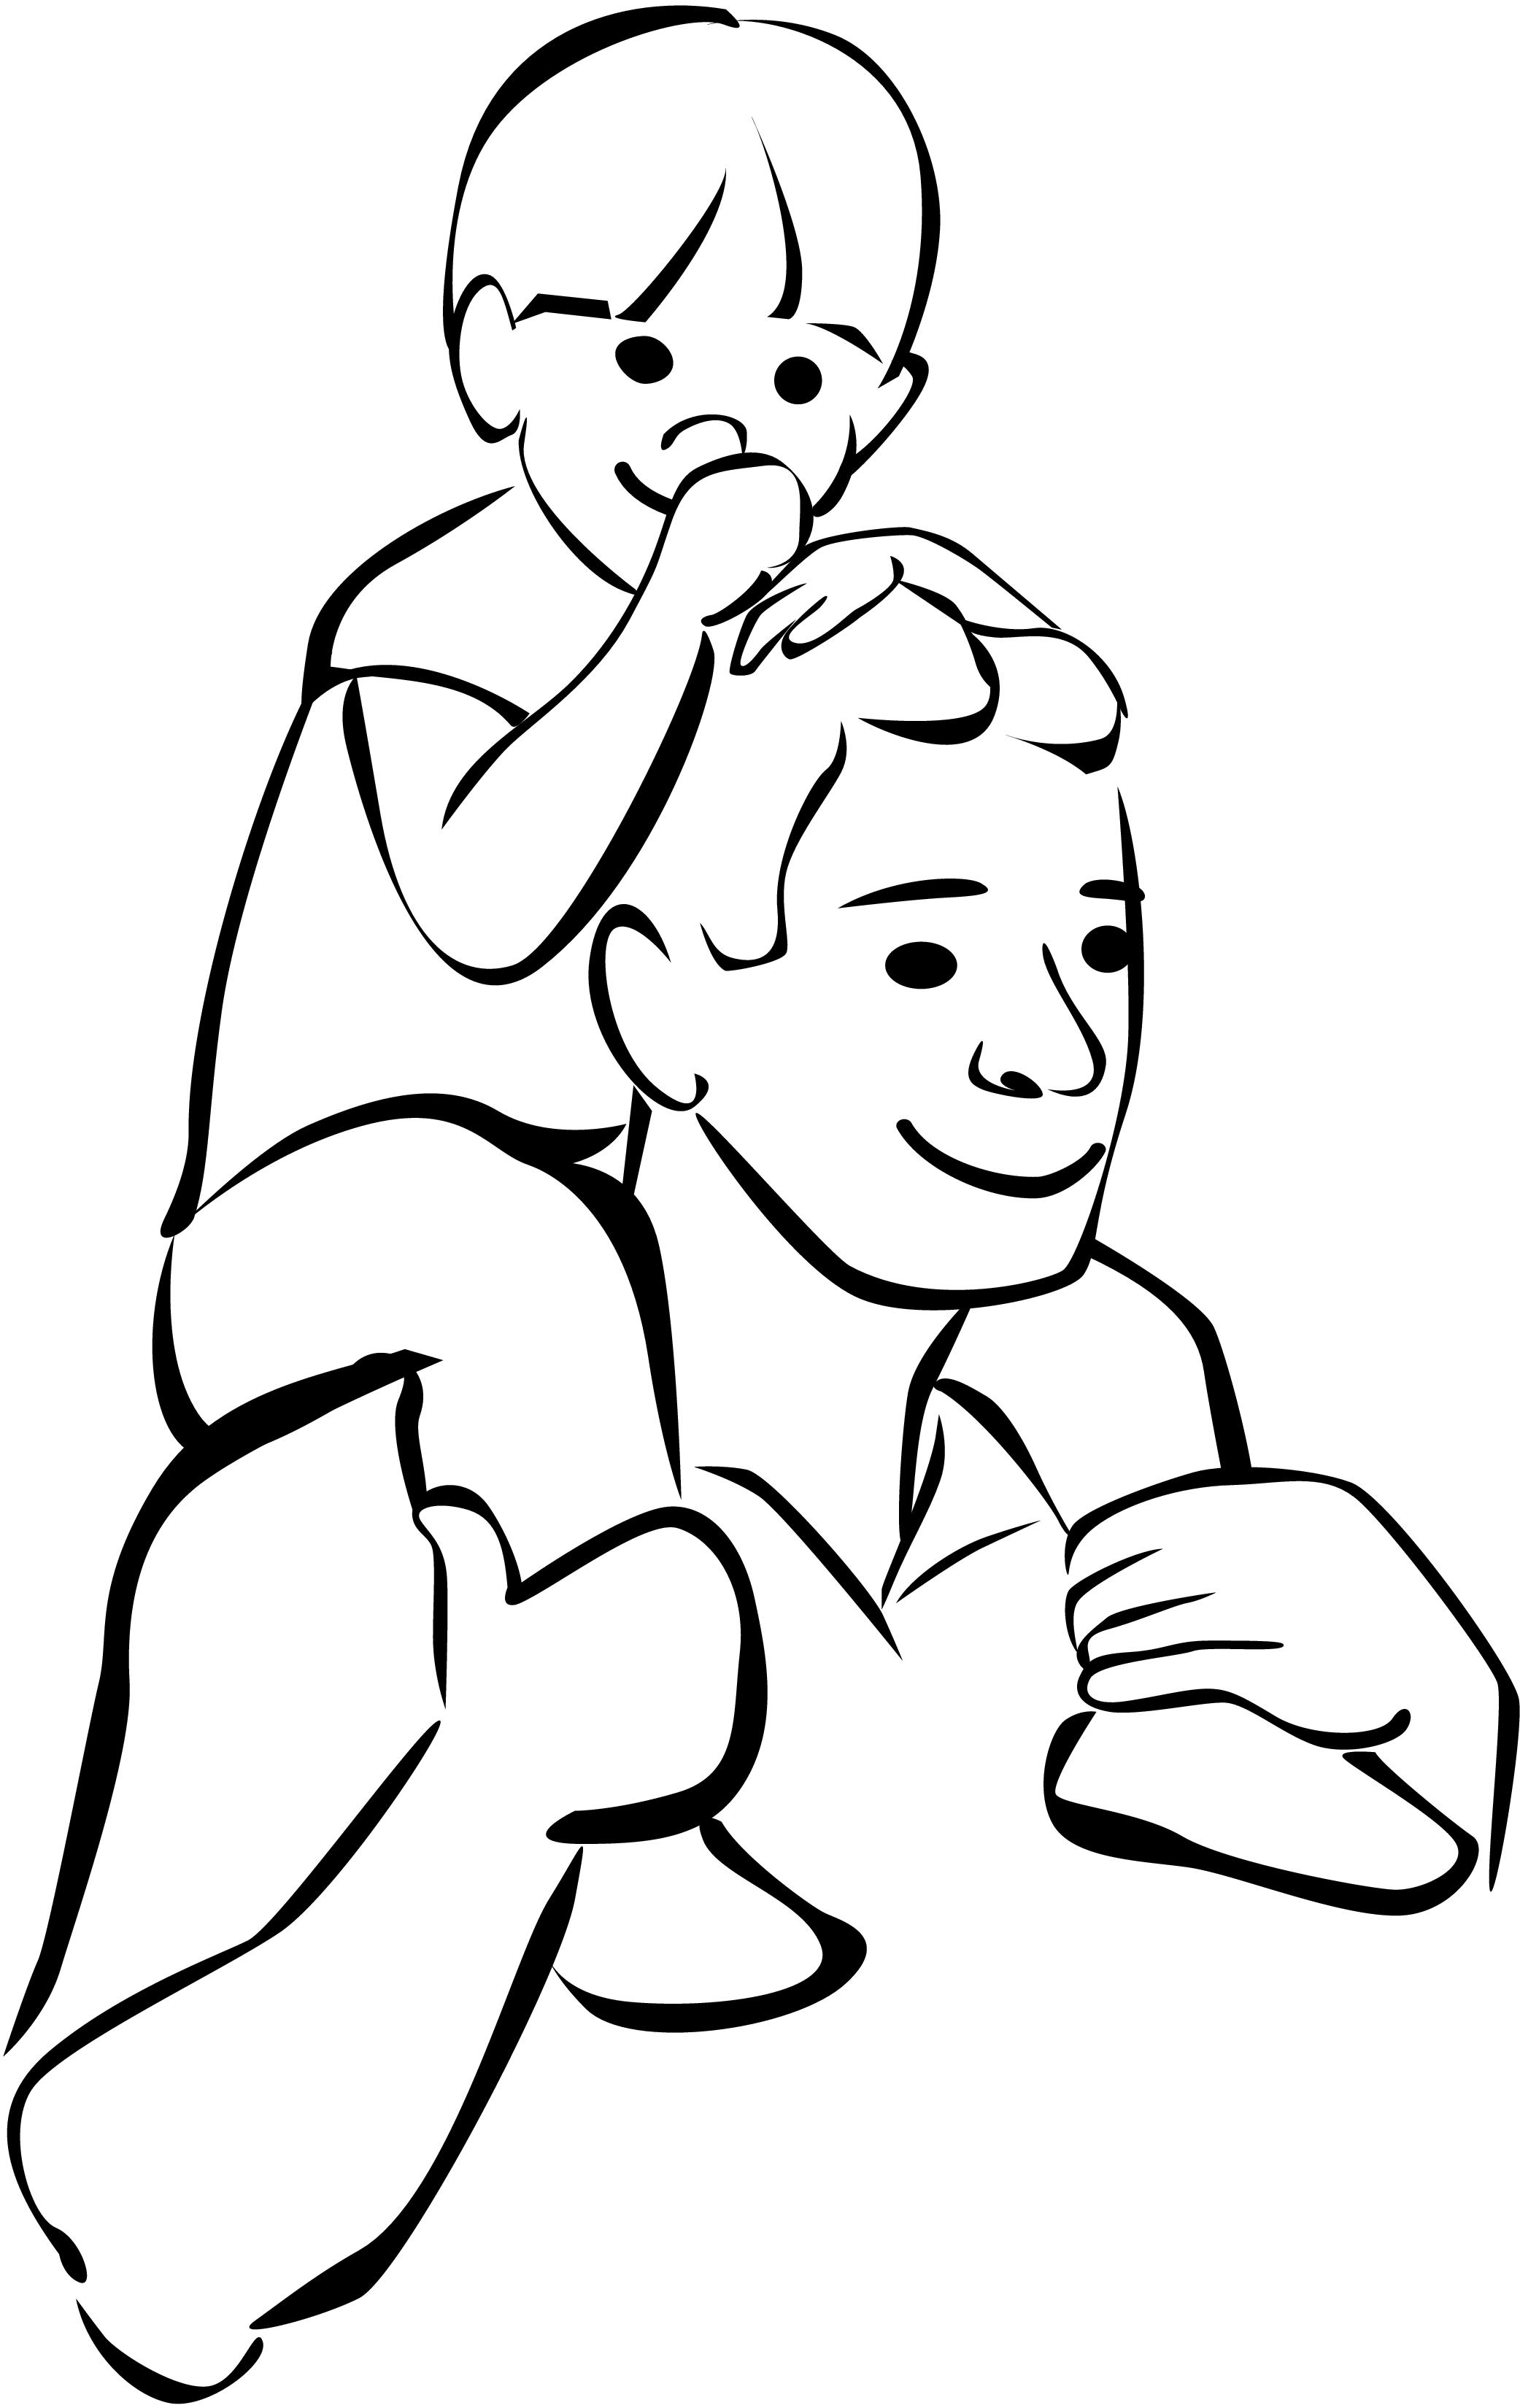 Student Raising Hand Clipart Black And White